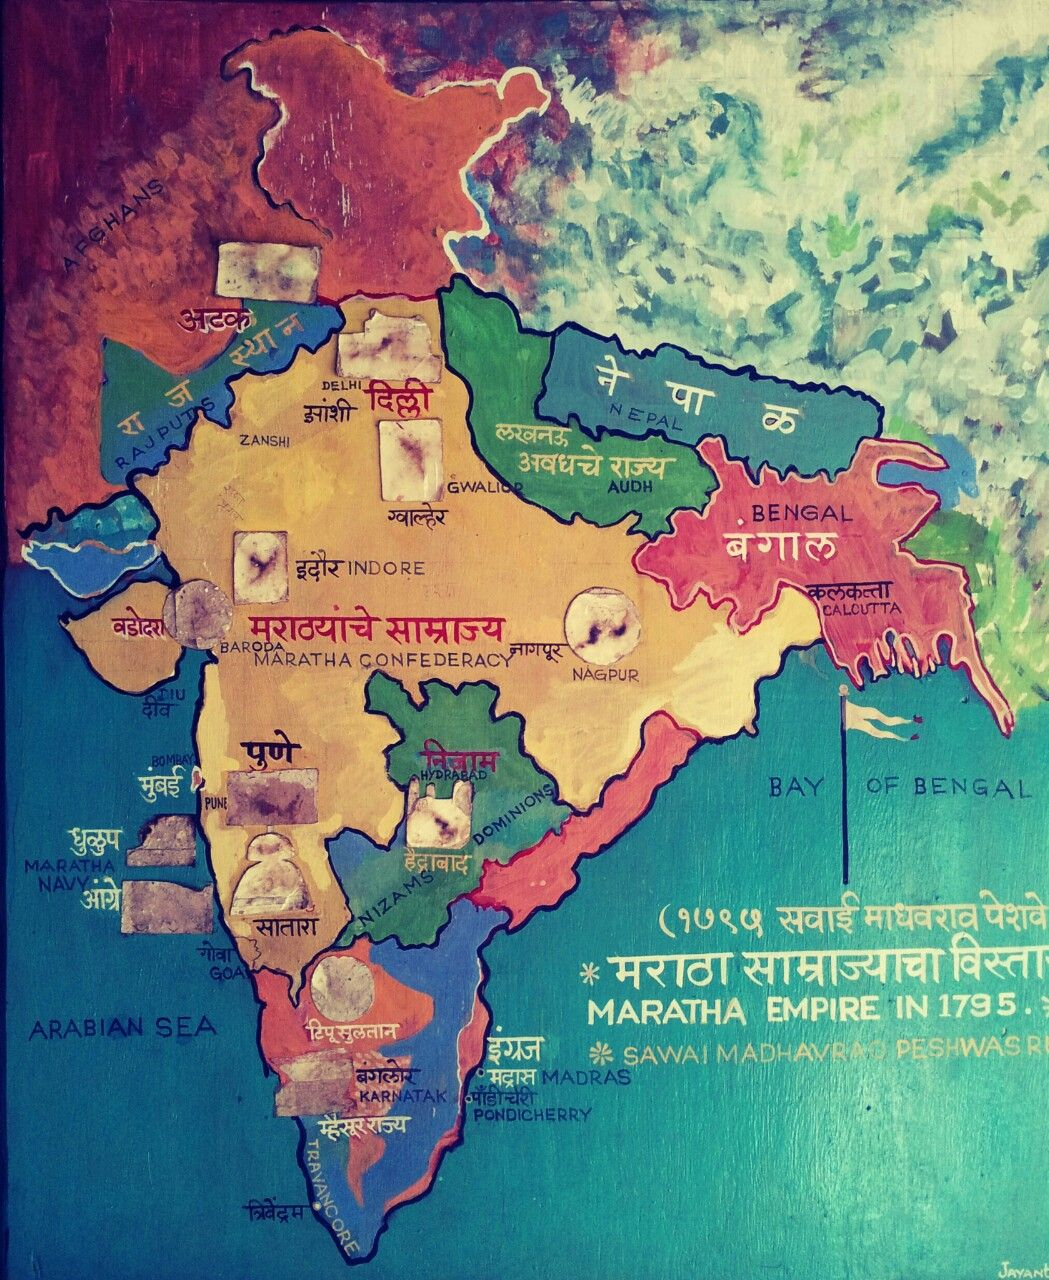 Map of the Maratha Empire in 1795 | Legend's | India map, History of India Map Com on maharashtra map, korea map, california map, africa map, brazil map, russia map, karnataka map, time zone map, texas map, australia map, japan map, andhra pradesh map, china map, france map, sri lanka map, indian subcontinent map, canada map, europe map, arabian sea map,